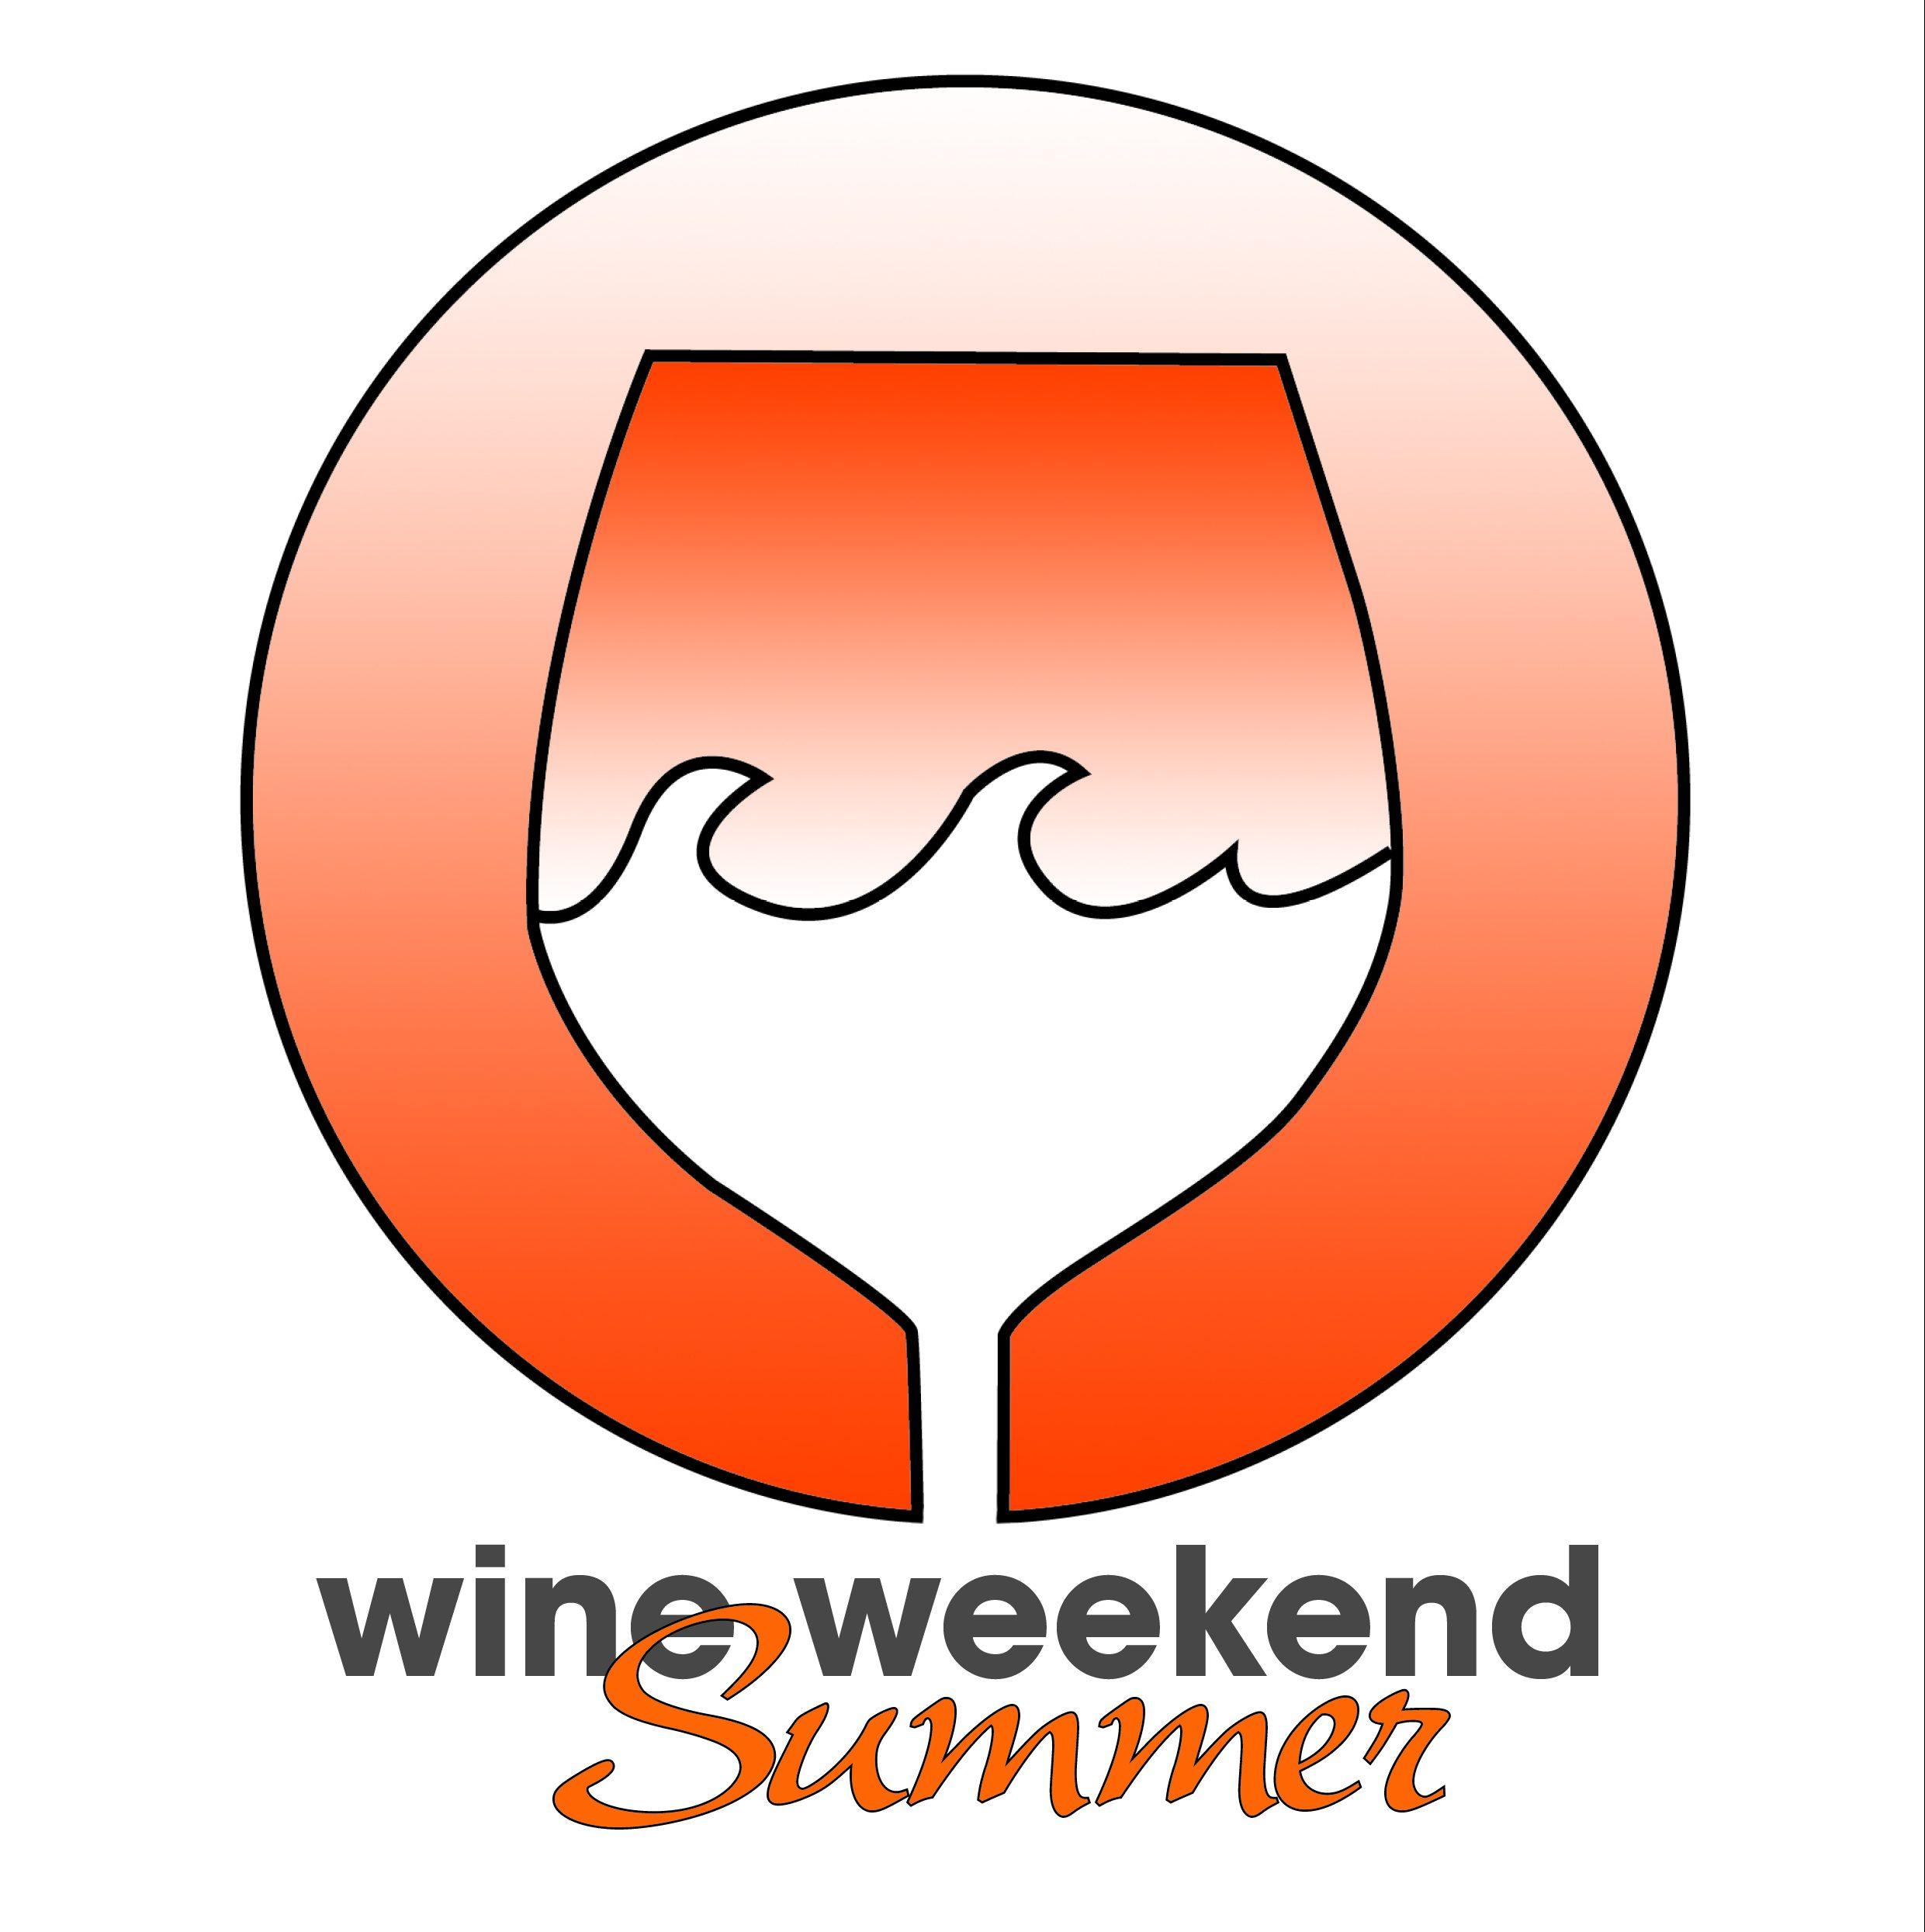 Wine Weekend Summer - Viva o Vinho